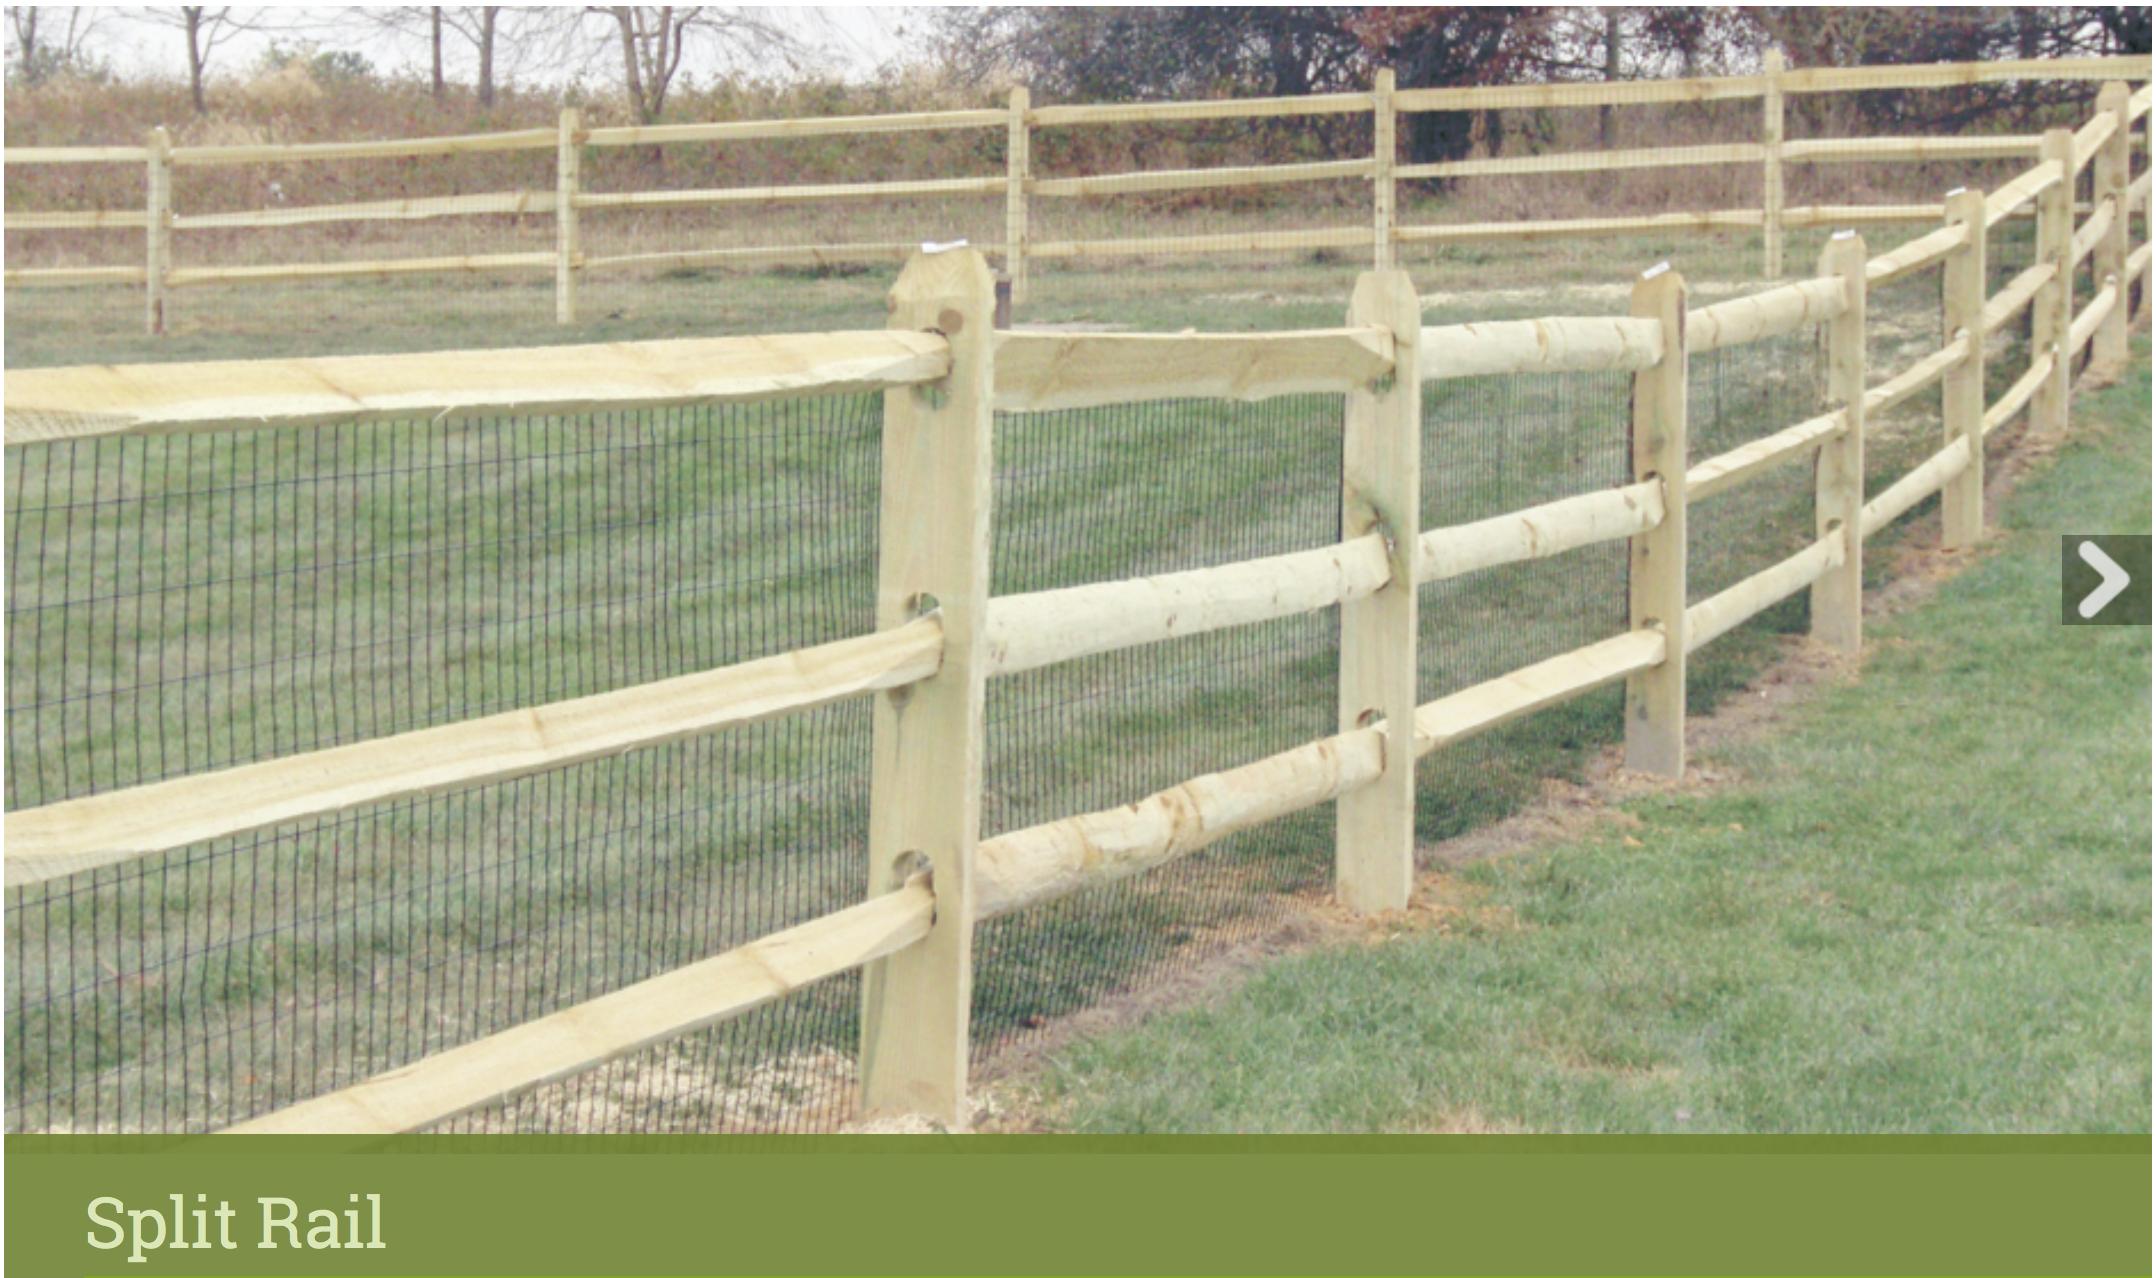 Https Www Longfence Com Residential Fence Wood Split Rail Split Rail Fence Outdoor Structures